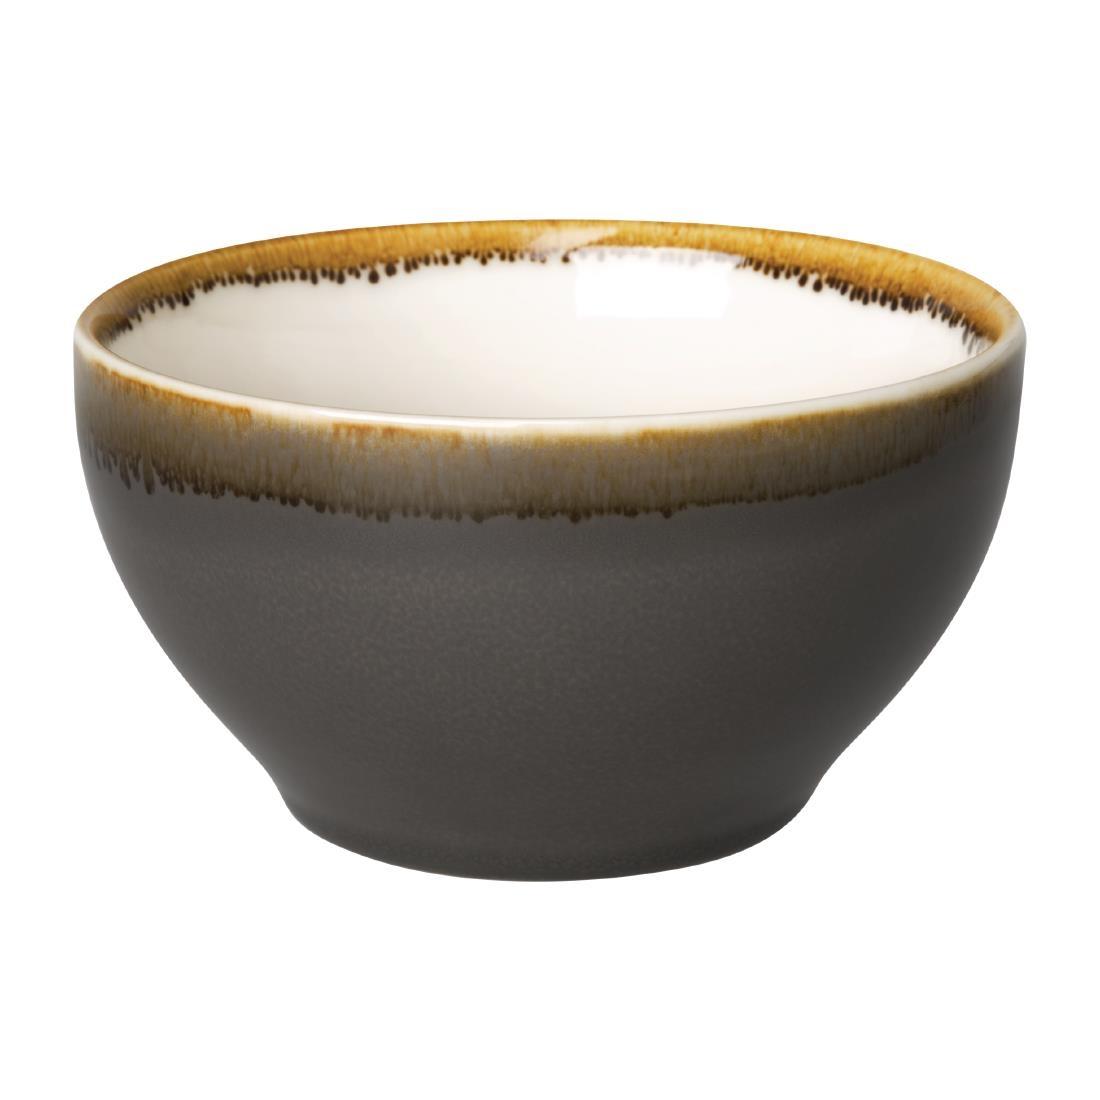 Round Bowl - Smoke